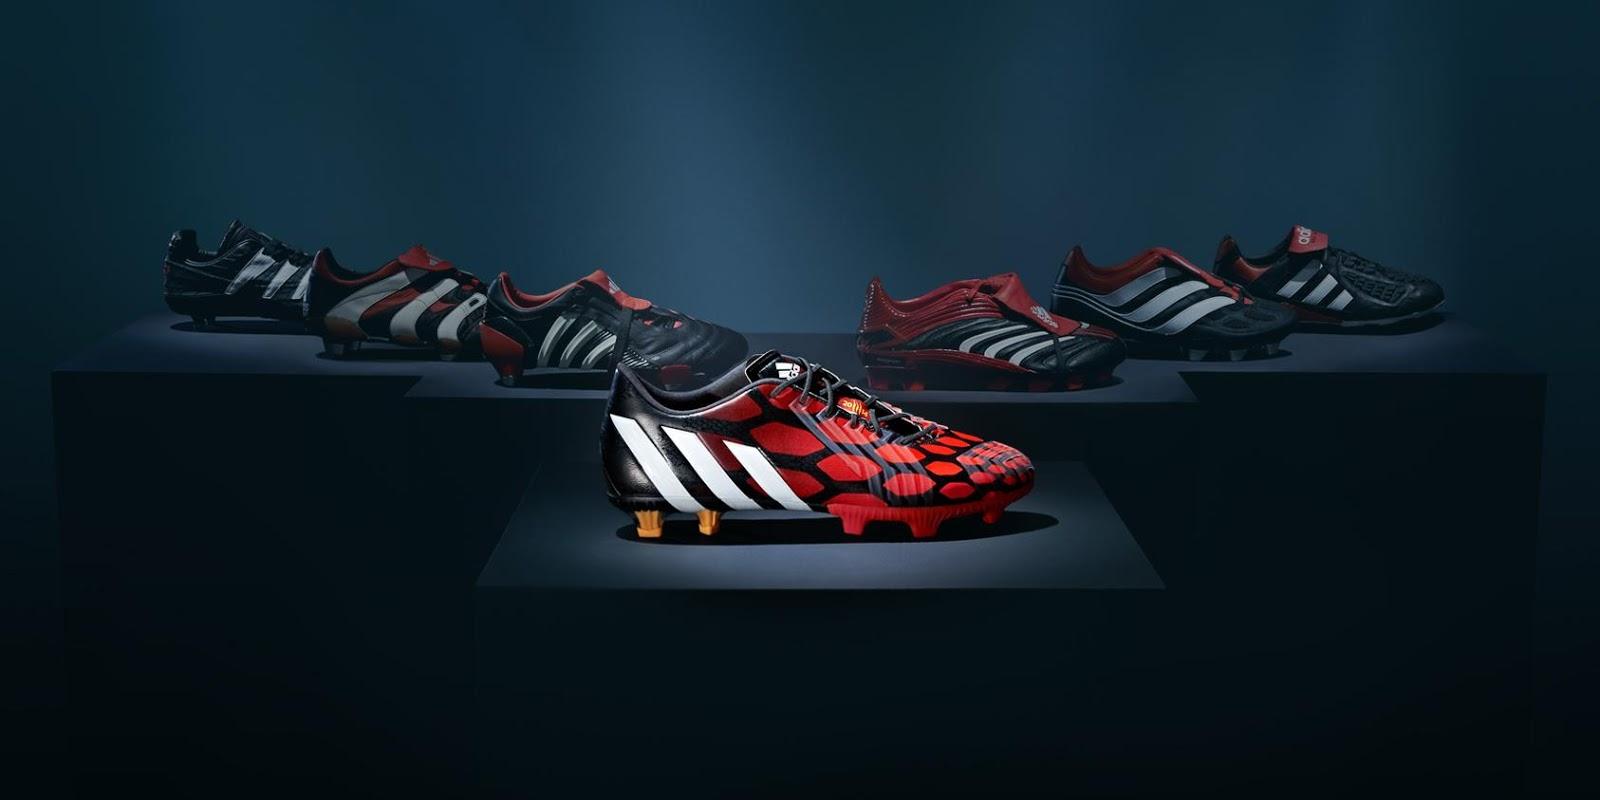 Predator Instinct: lo speciale anniversario di adidas